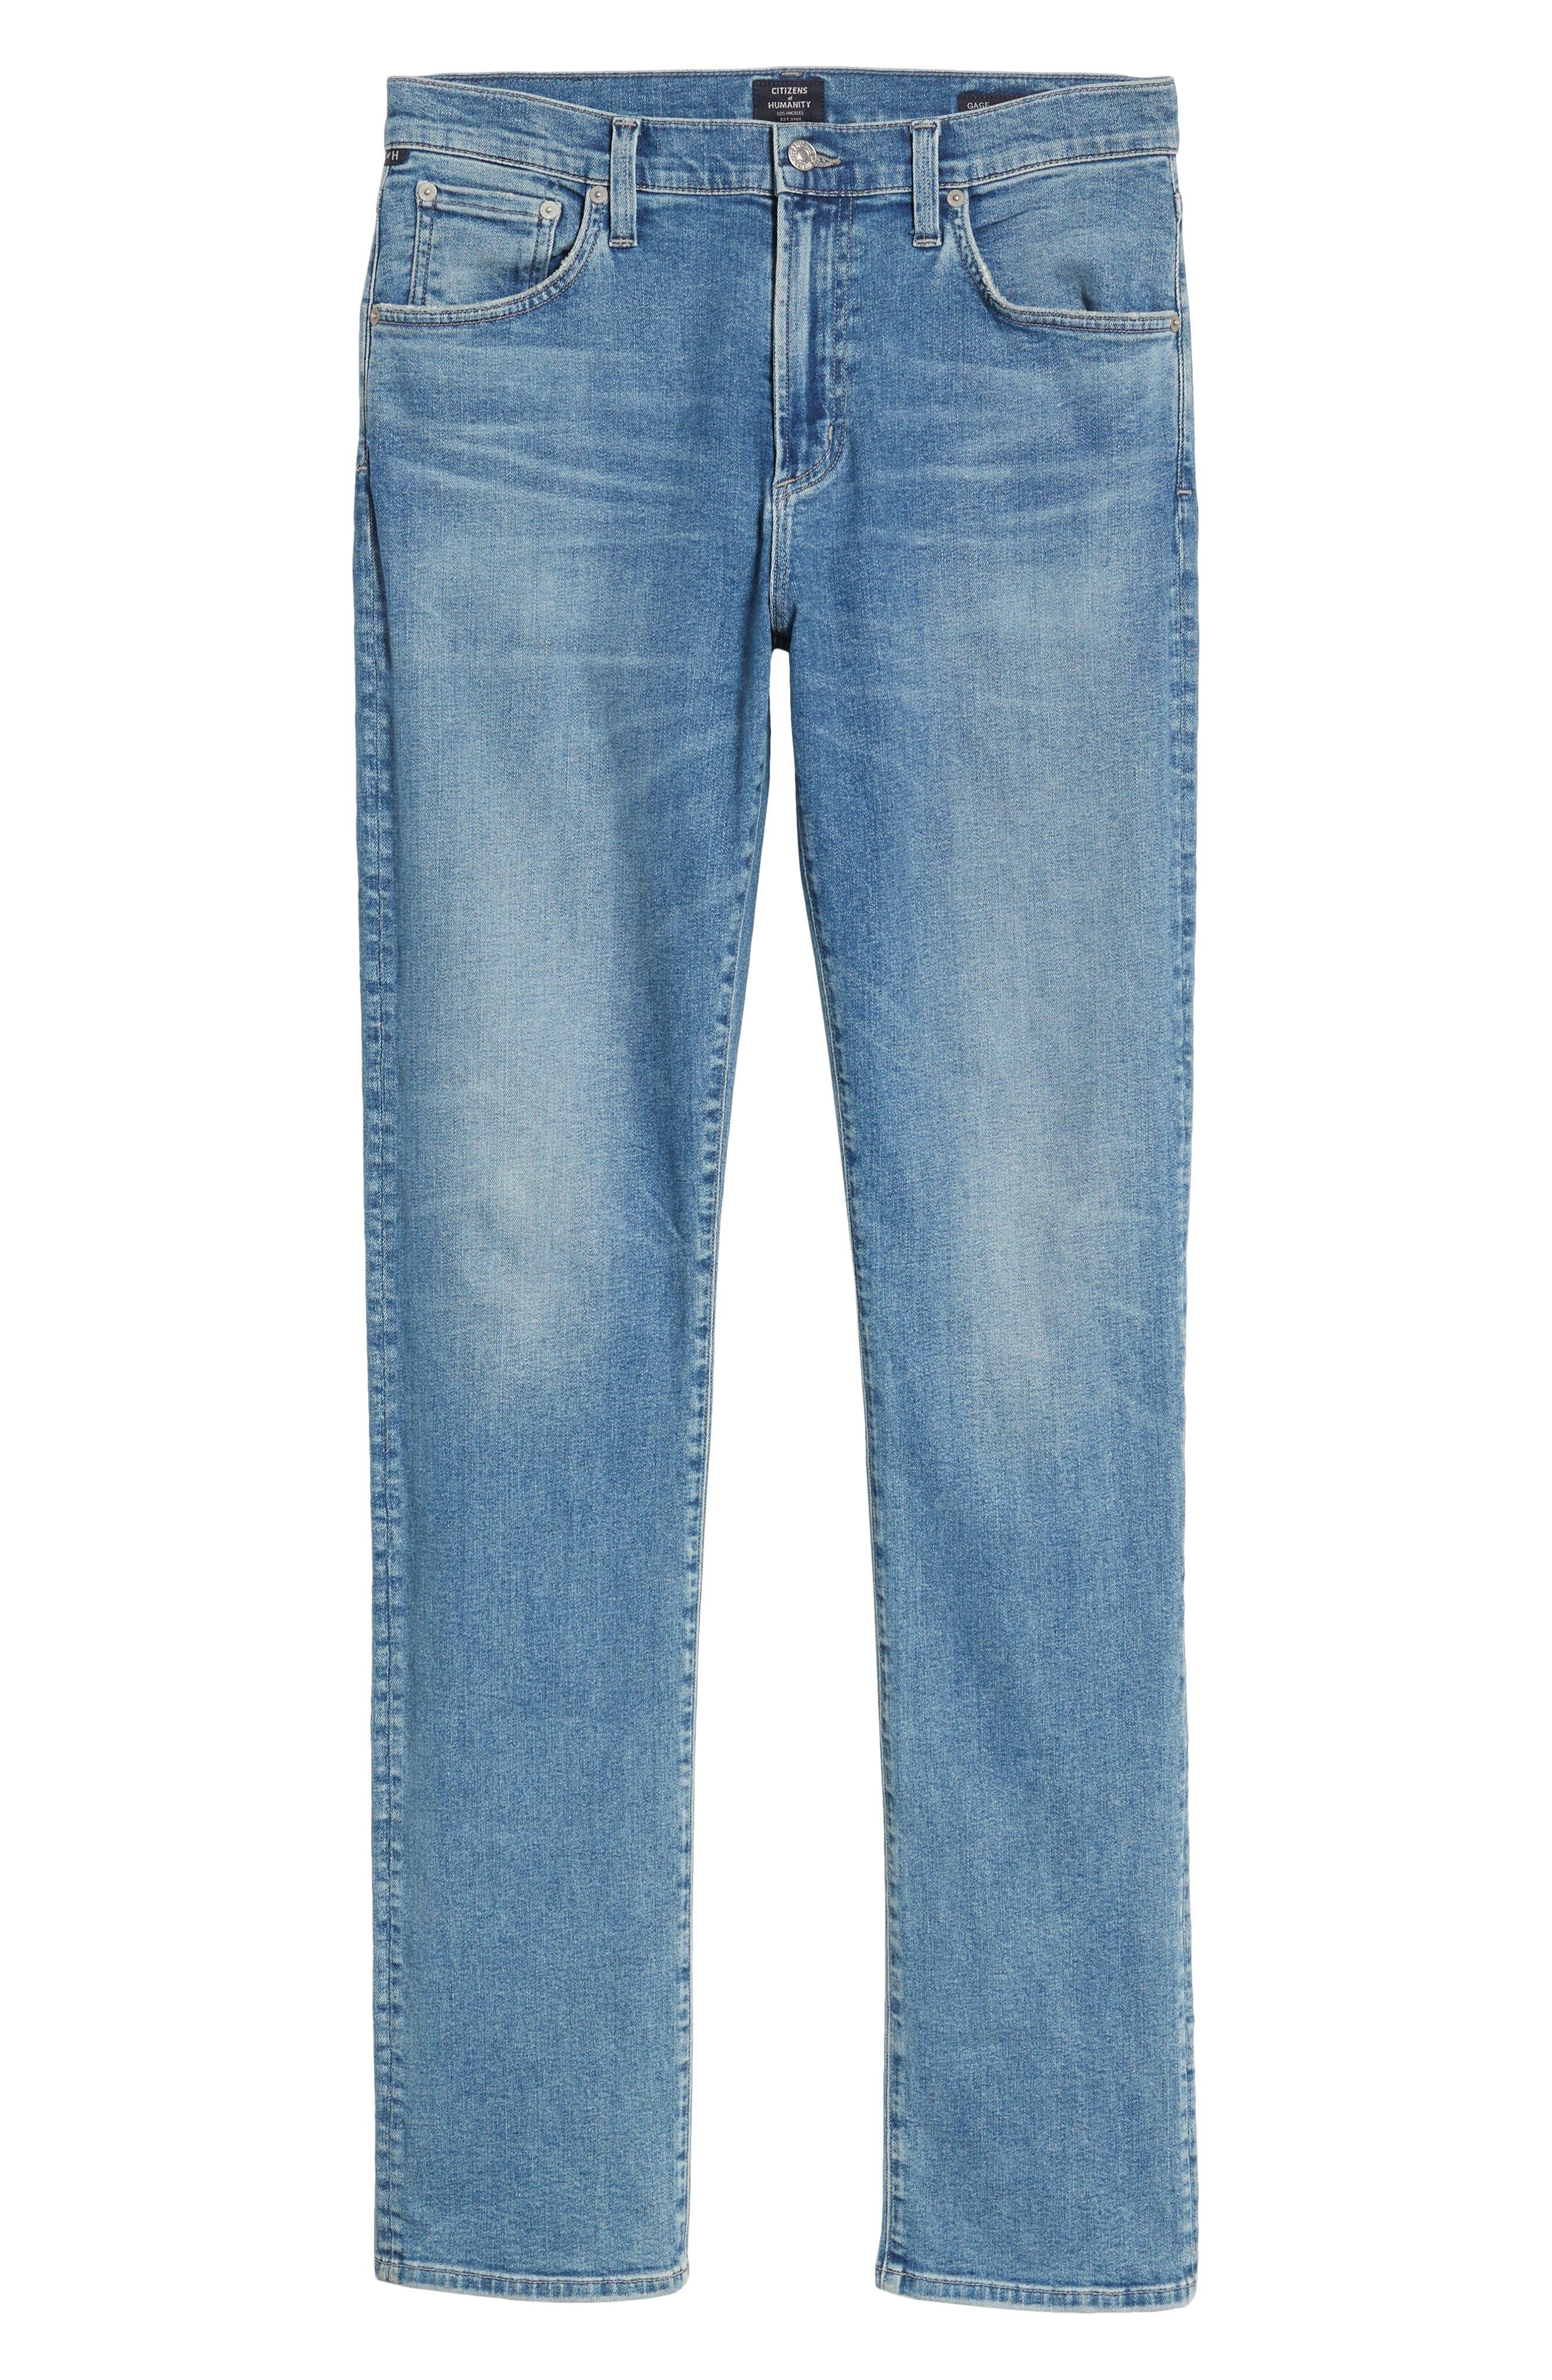 Gage Slim Straight Leg Jeans,                             Alternate thumbnail 6, color,                             Hemingway